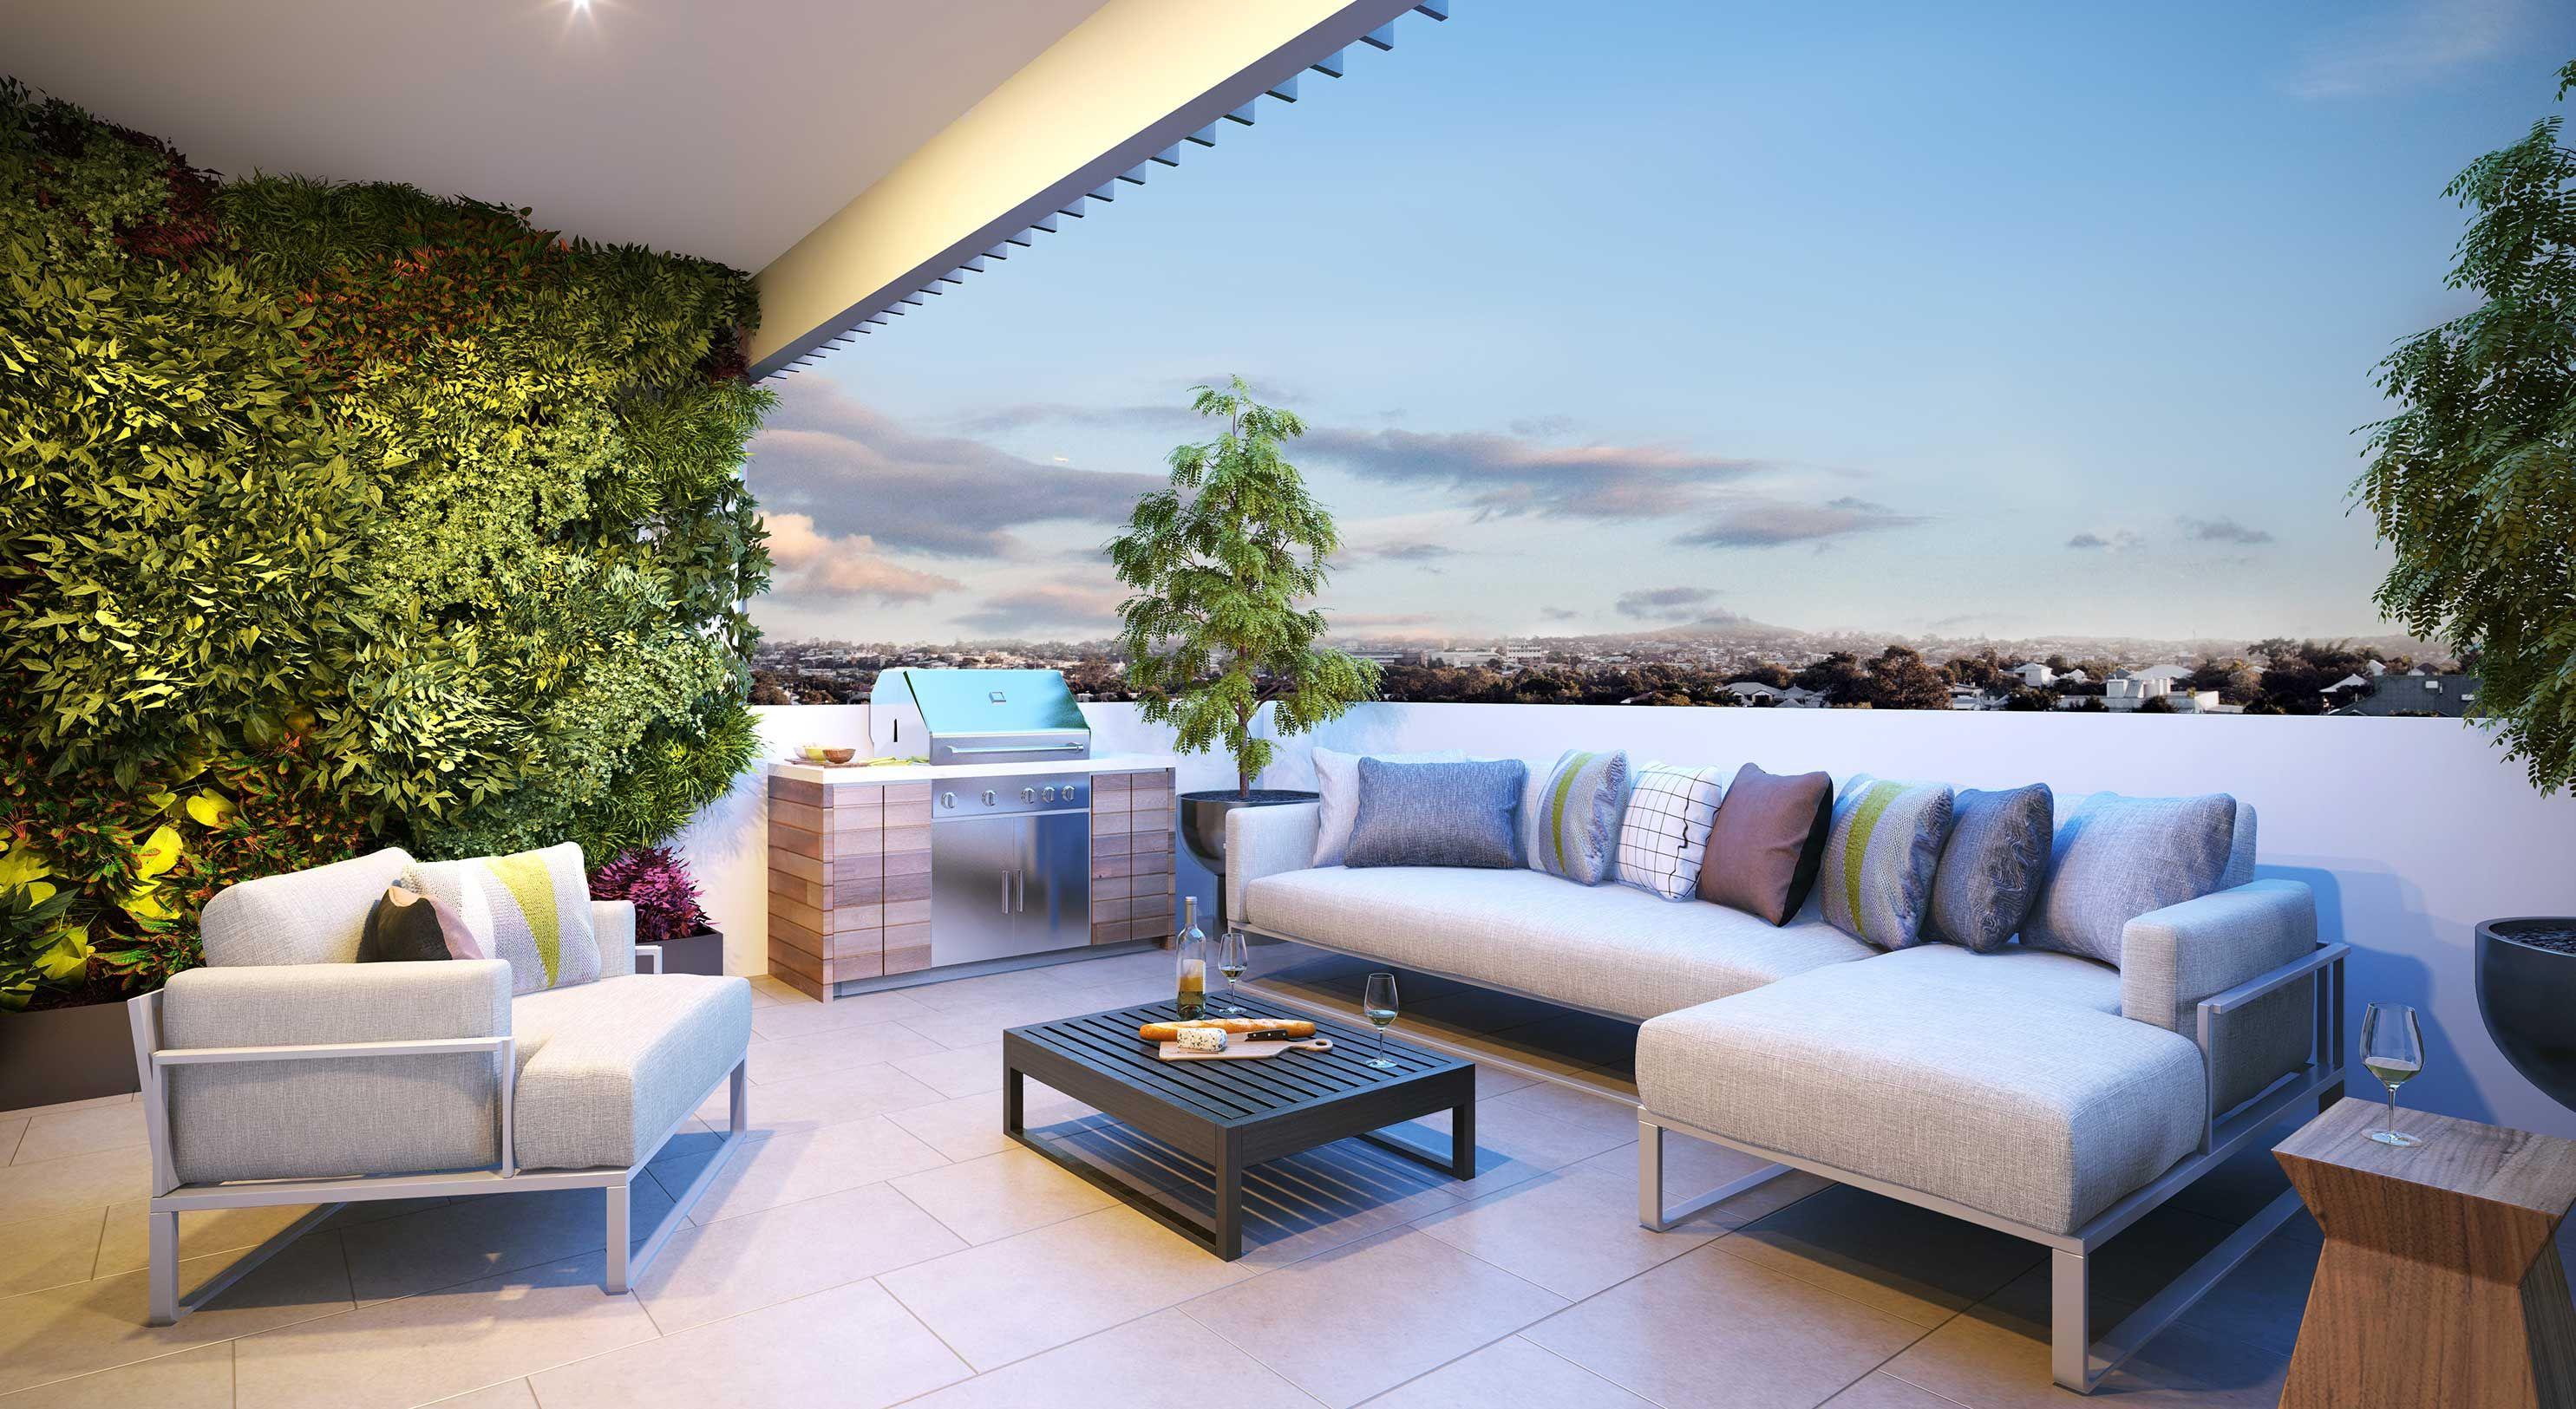 terraza chill out barbacoa   decoración chill out   pinterest